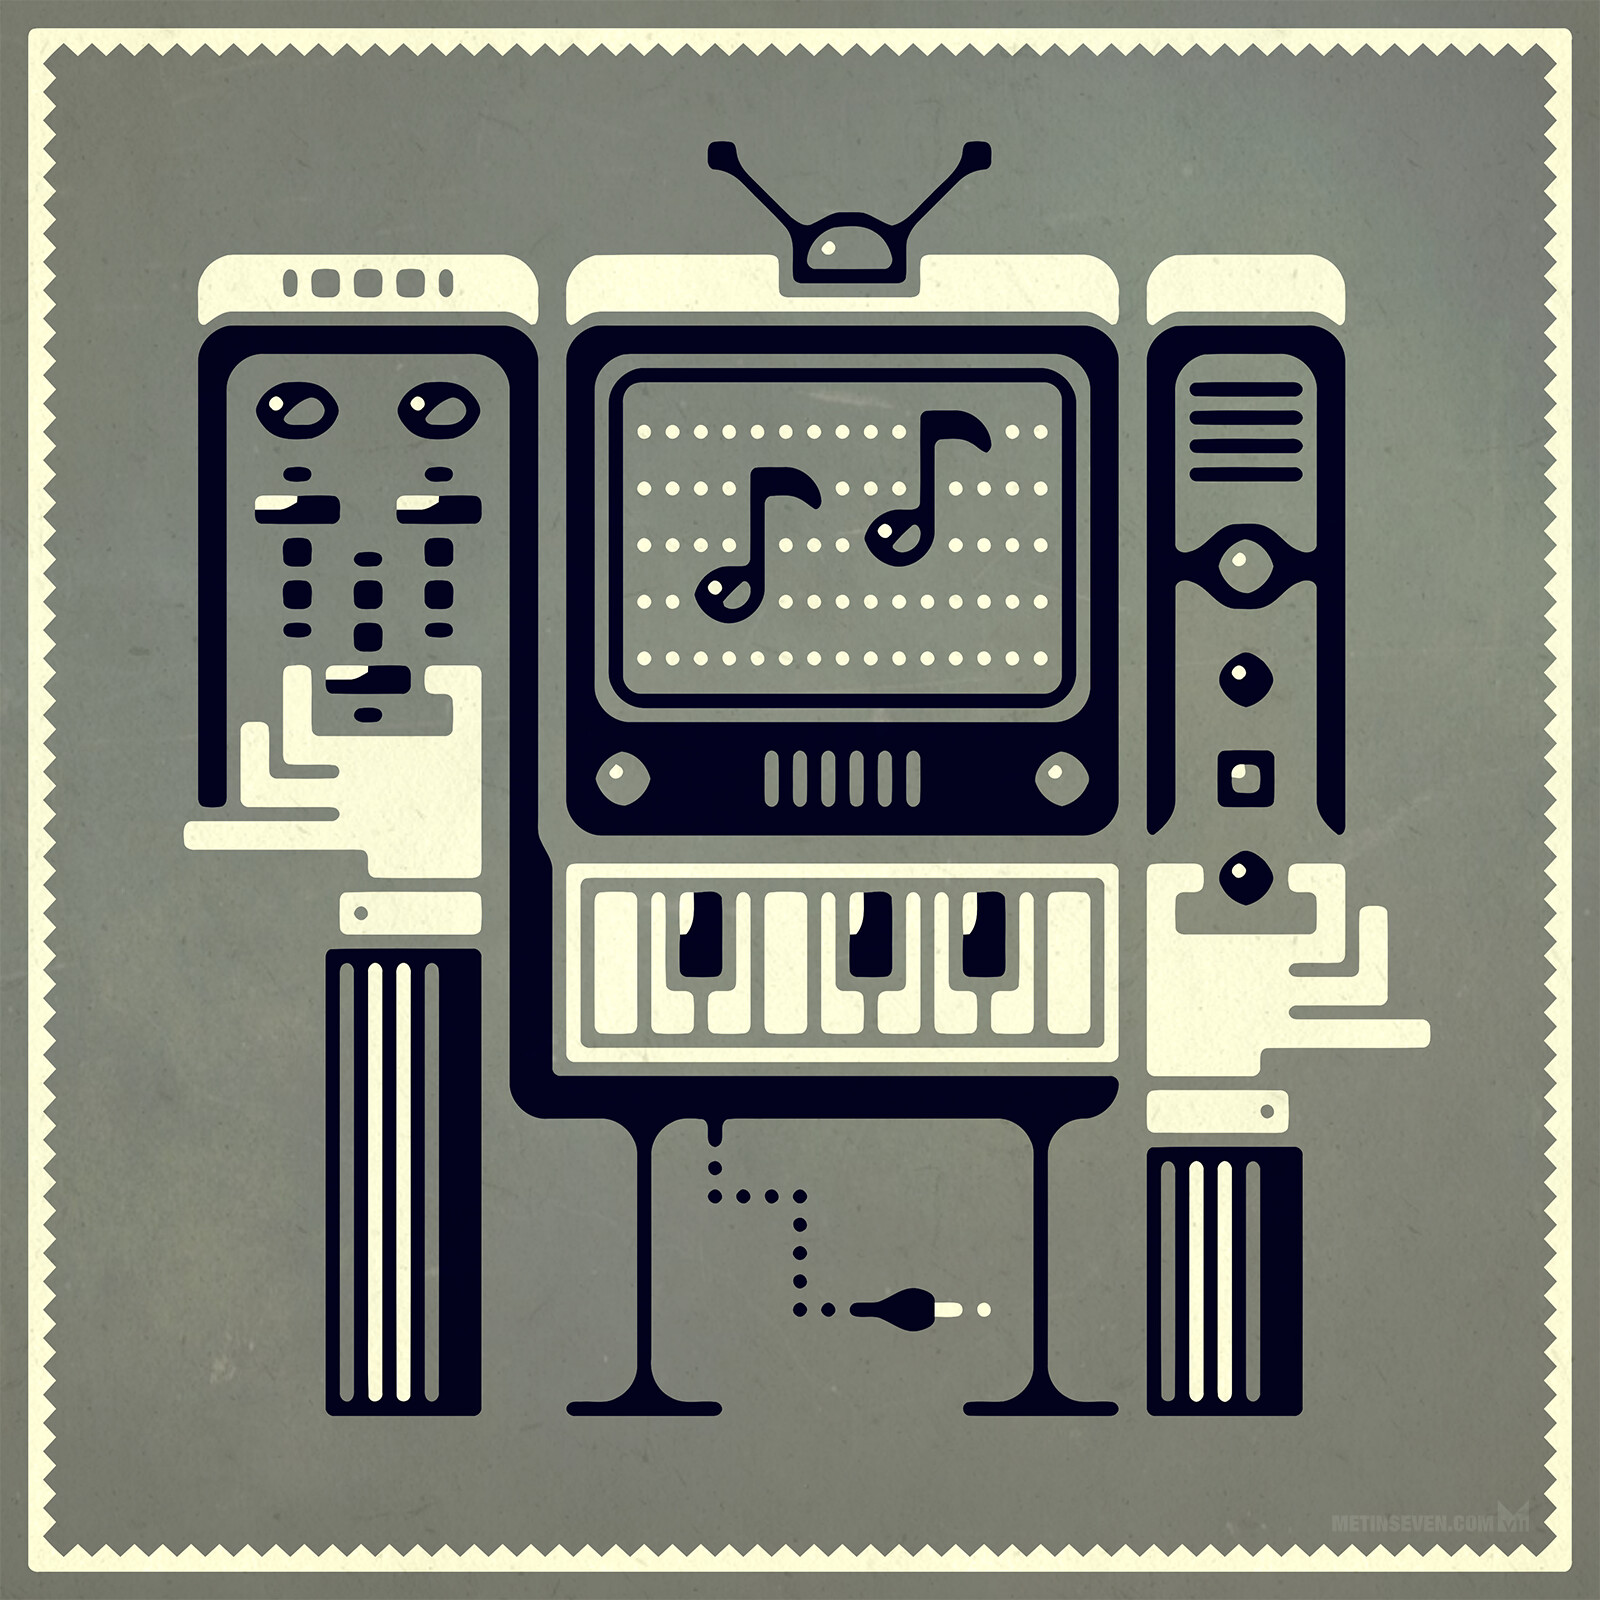 Retro-electronic music